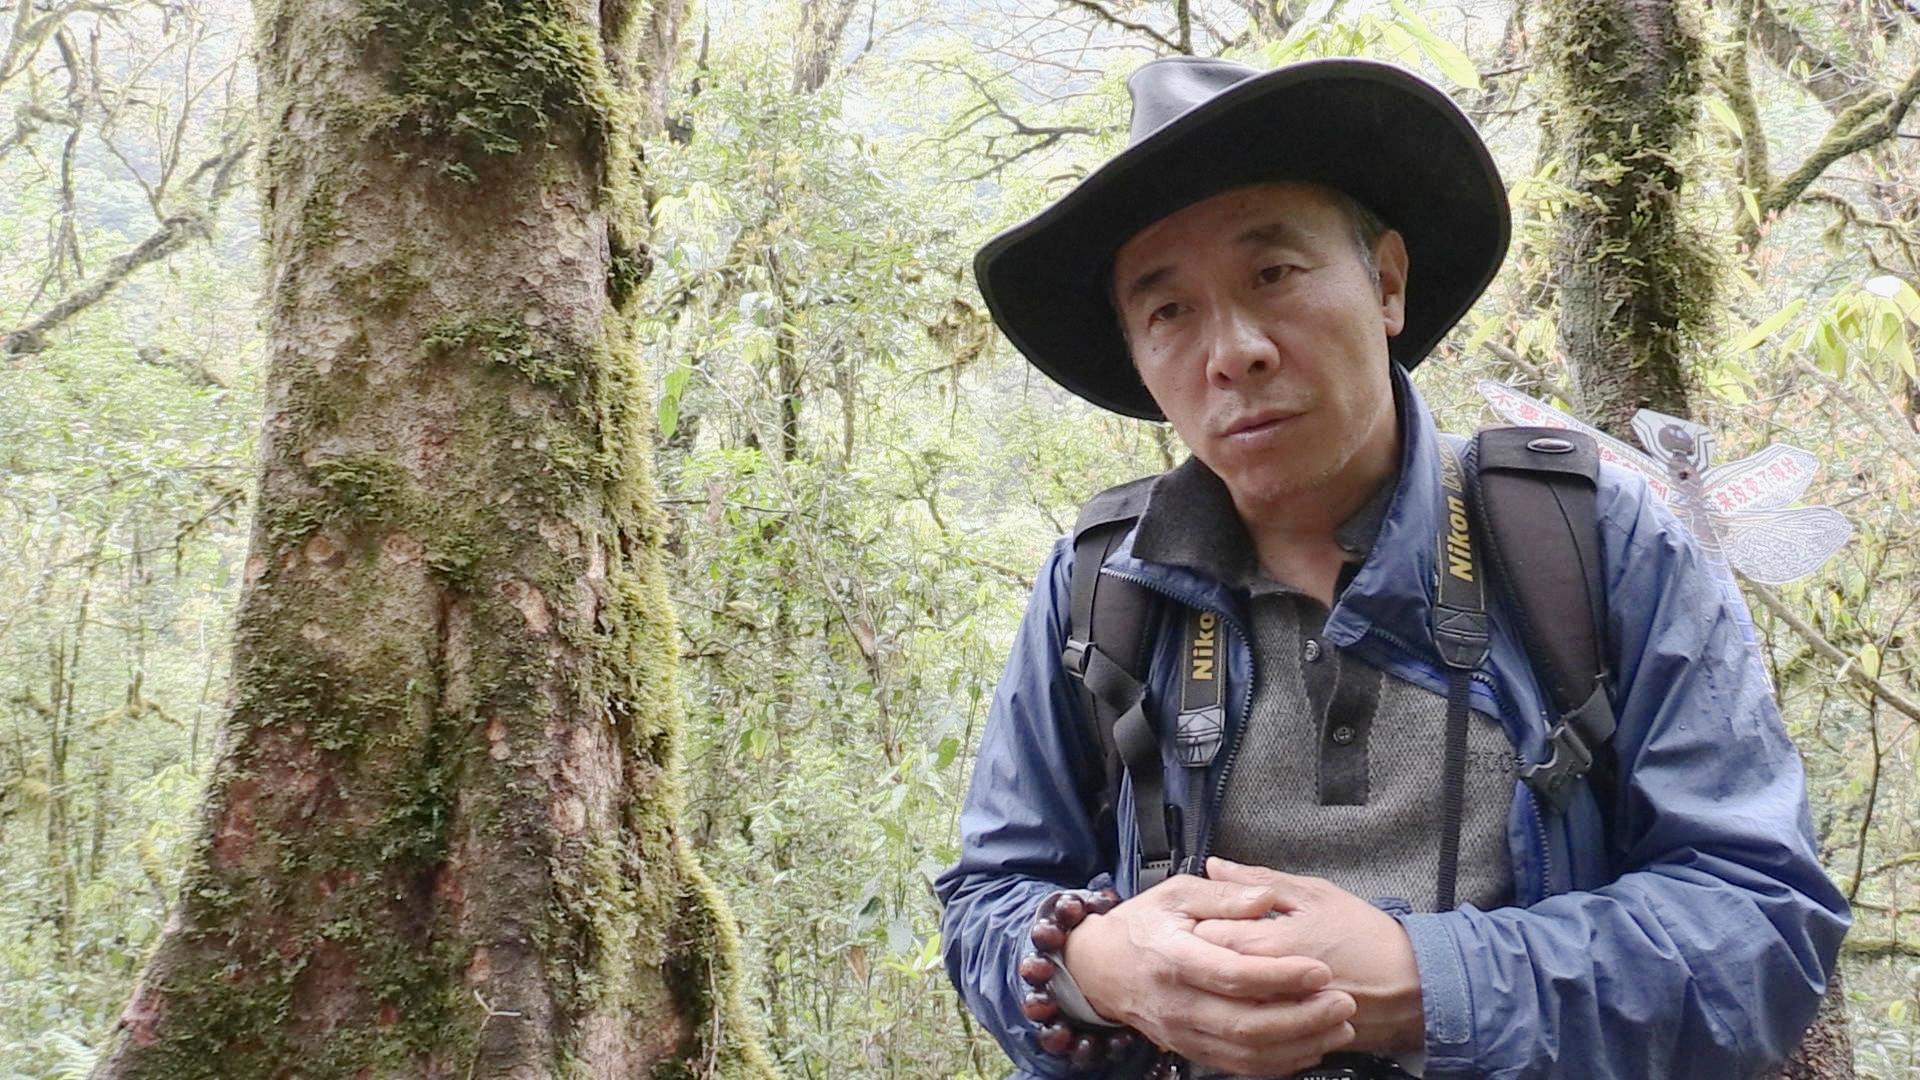 Fang Zhendong   Conservation Biologist   Fang Zhendong is the director of the Shangri-la Alpine Botanic Garden, located in Shangri-la, Yunnan province.